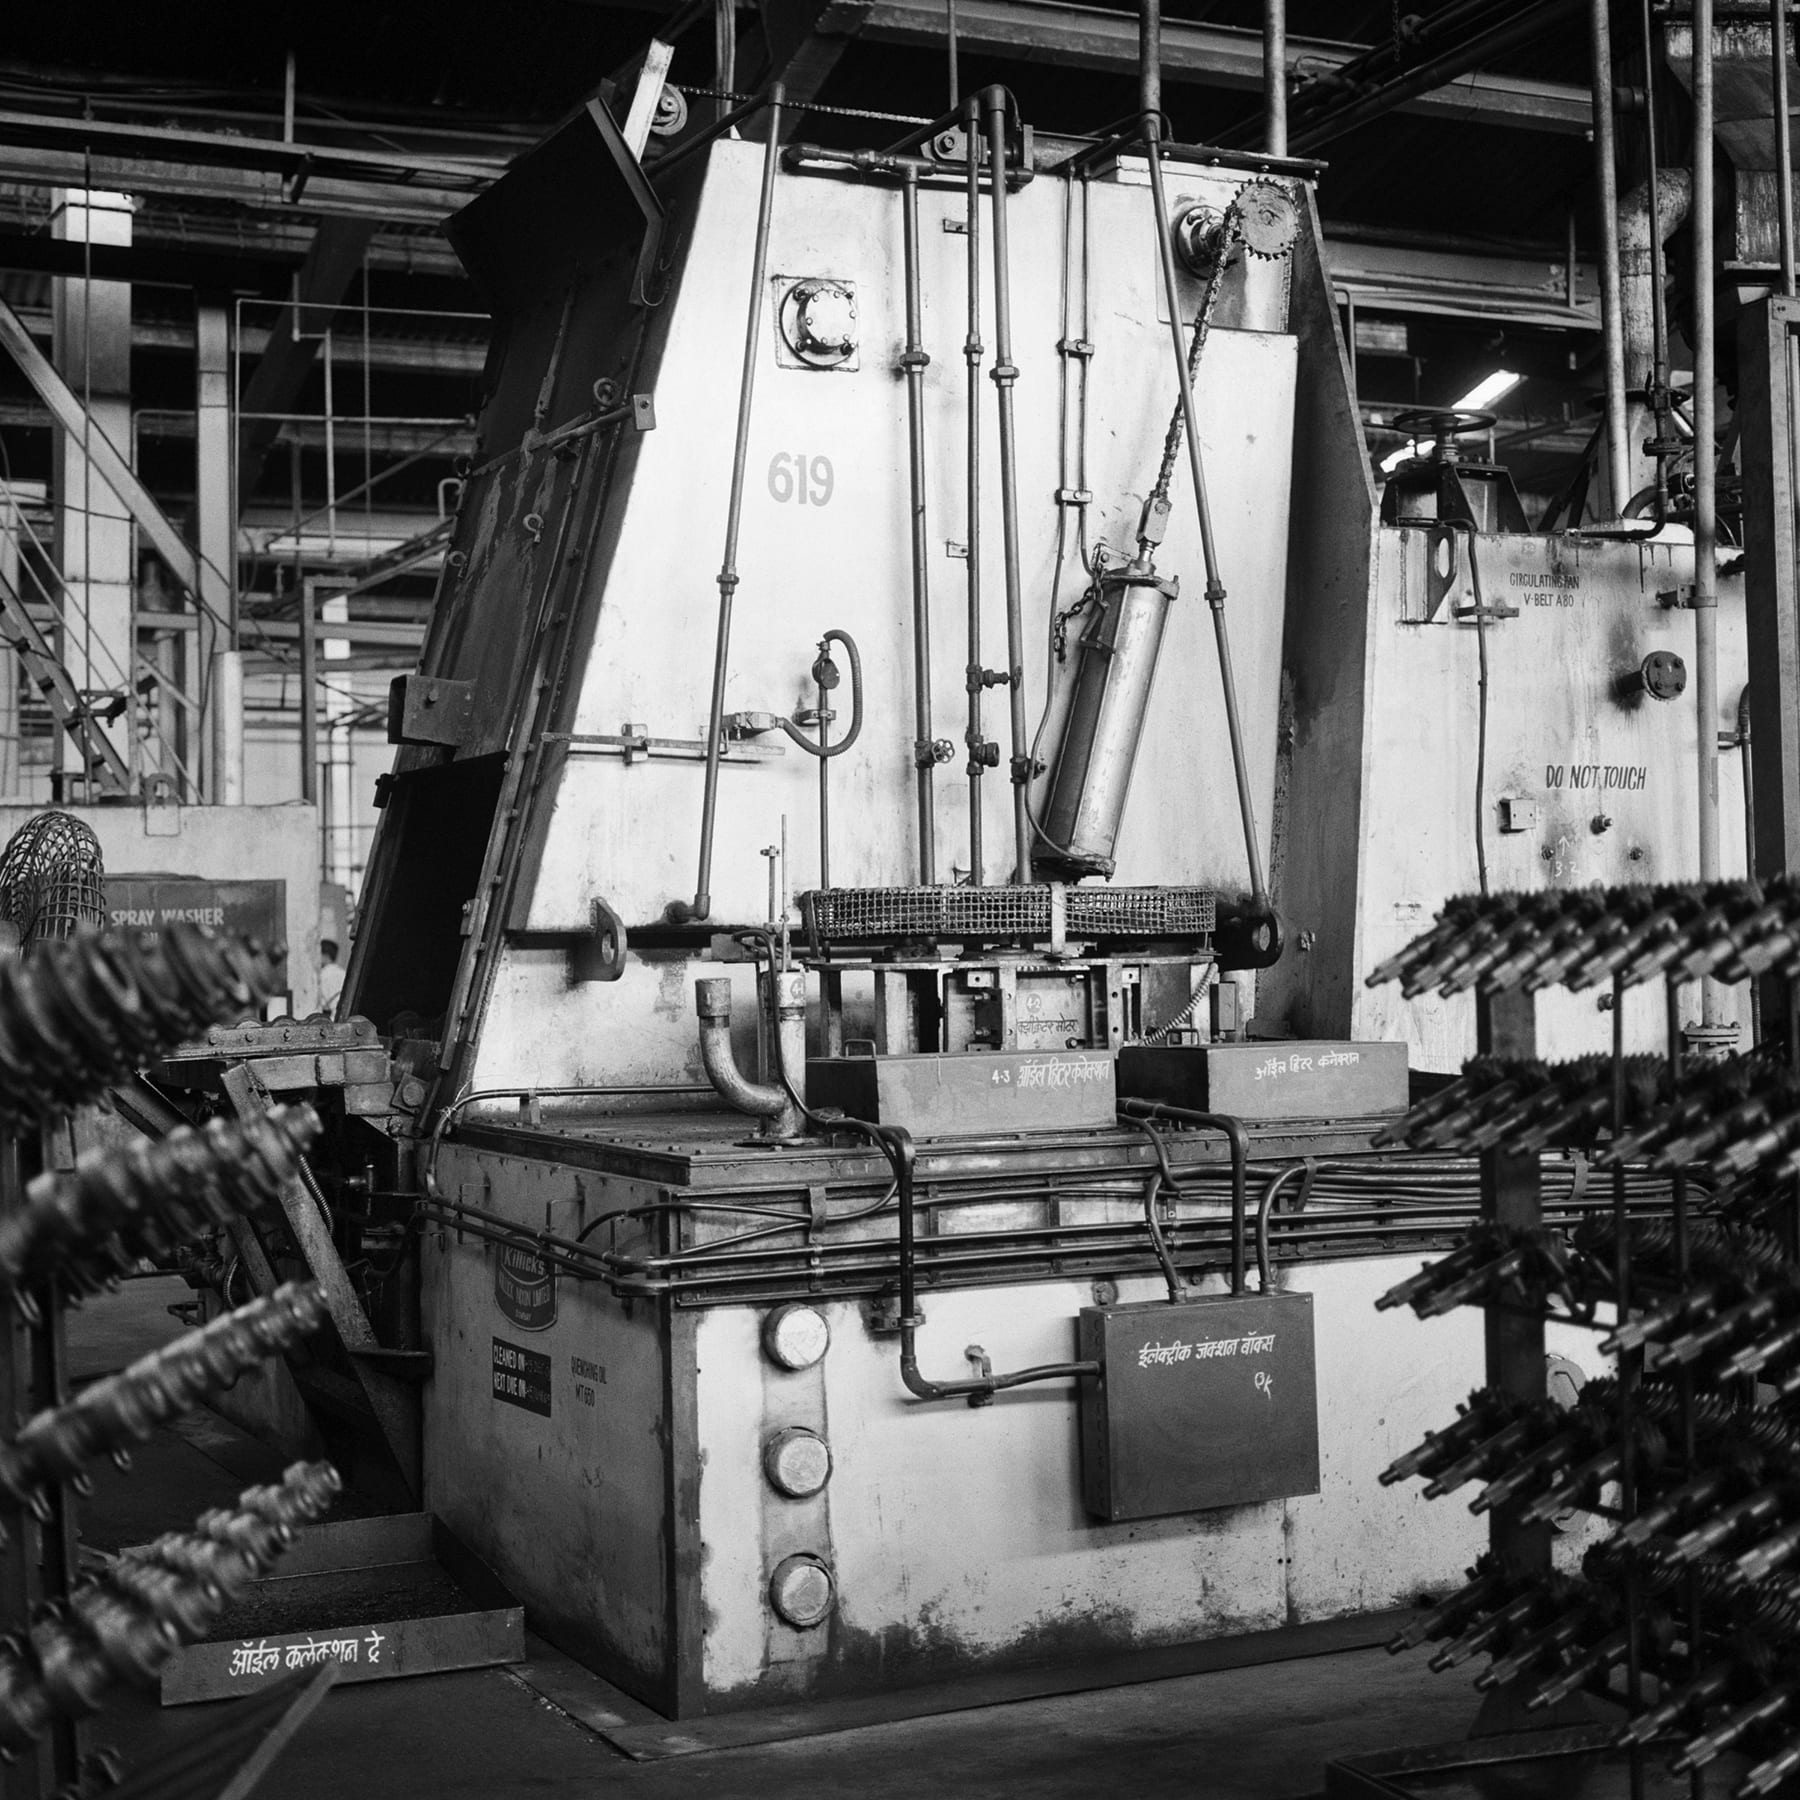 dayanita-singh_museum-of-machines-2